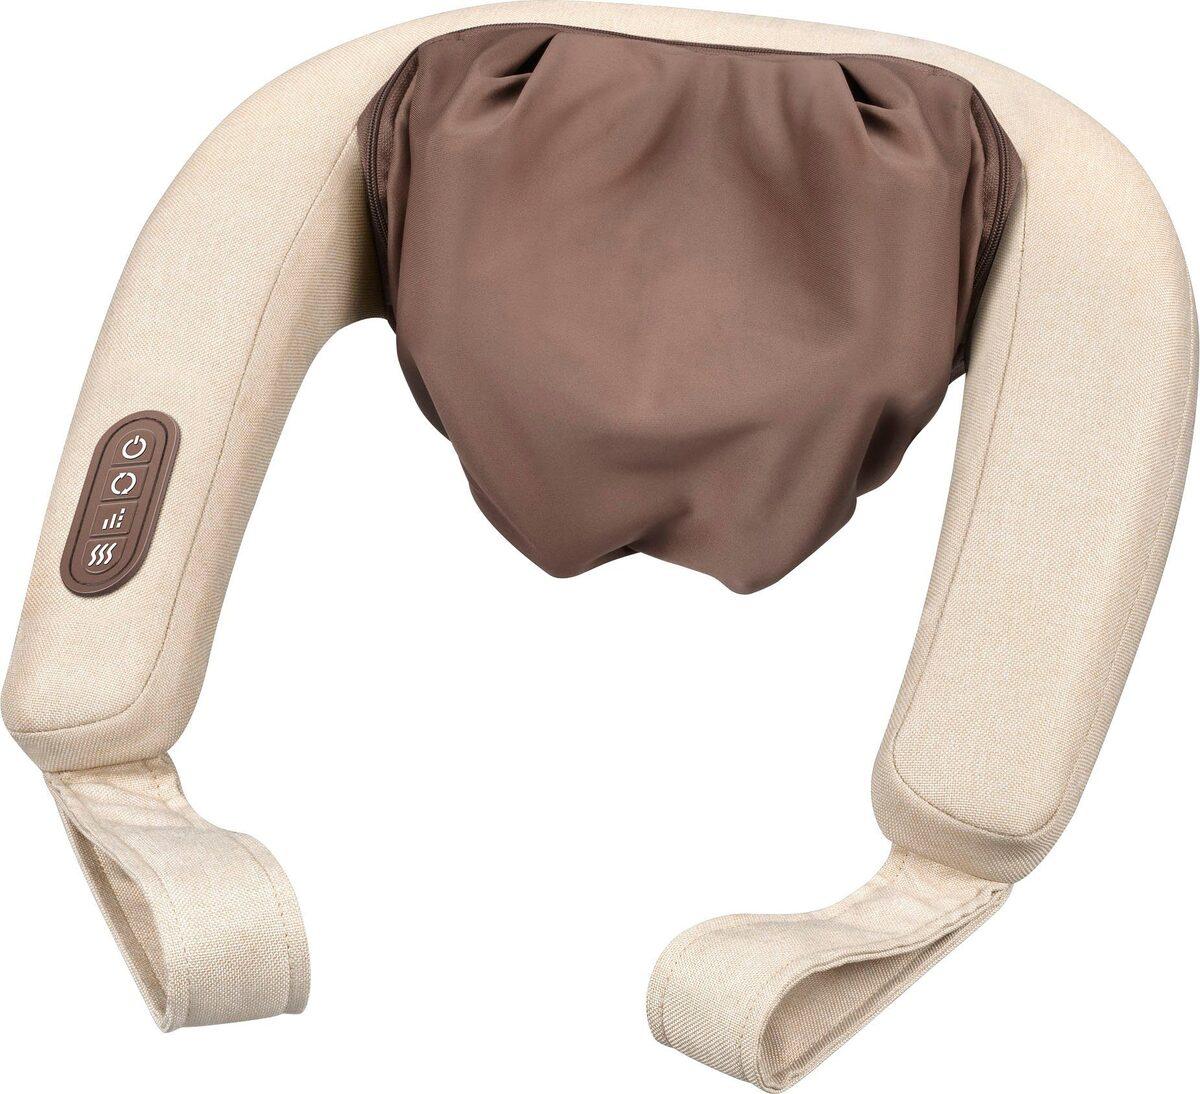 Bild 2 von BEURER Nacken-Massagegerät »MG 153 4D«, 1-tlg.